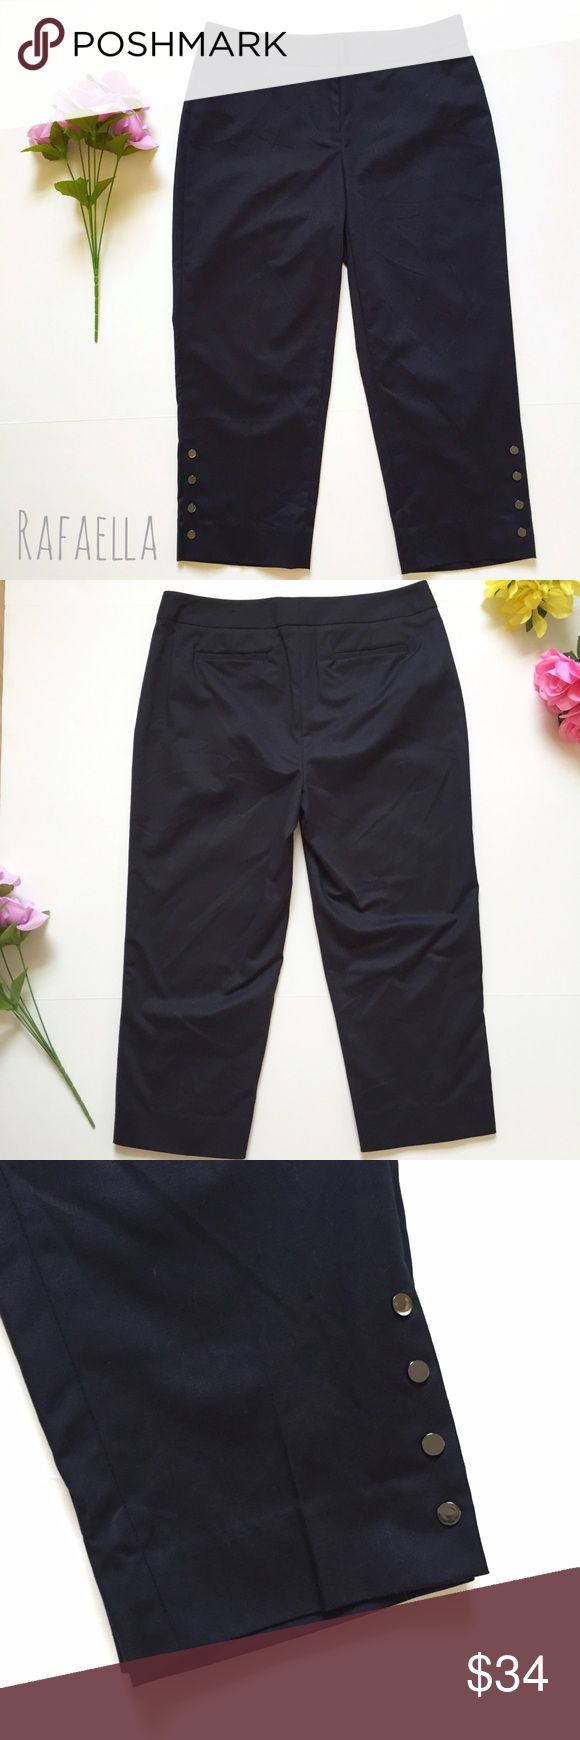 ❗️Flash sale❗️Rafaella pants.  Brand New Without Tags-  Rafaella capris/pants NAVY BLUE  Size 4 Curvy.  Inseam 20.5in -  Waist down 30in.  58% Cotton - 39% Polyester - 3% Spandex Rafaella Pants